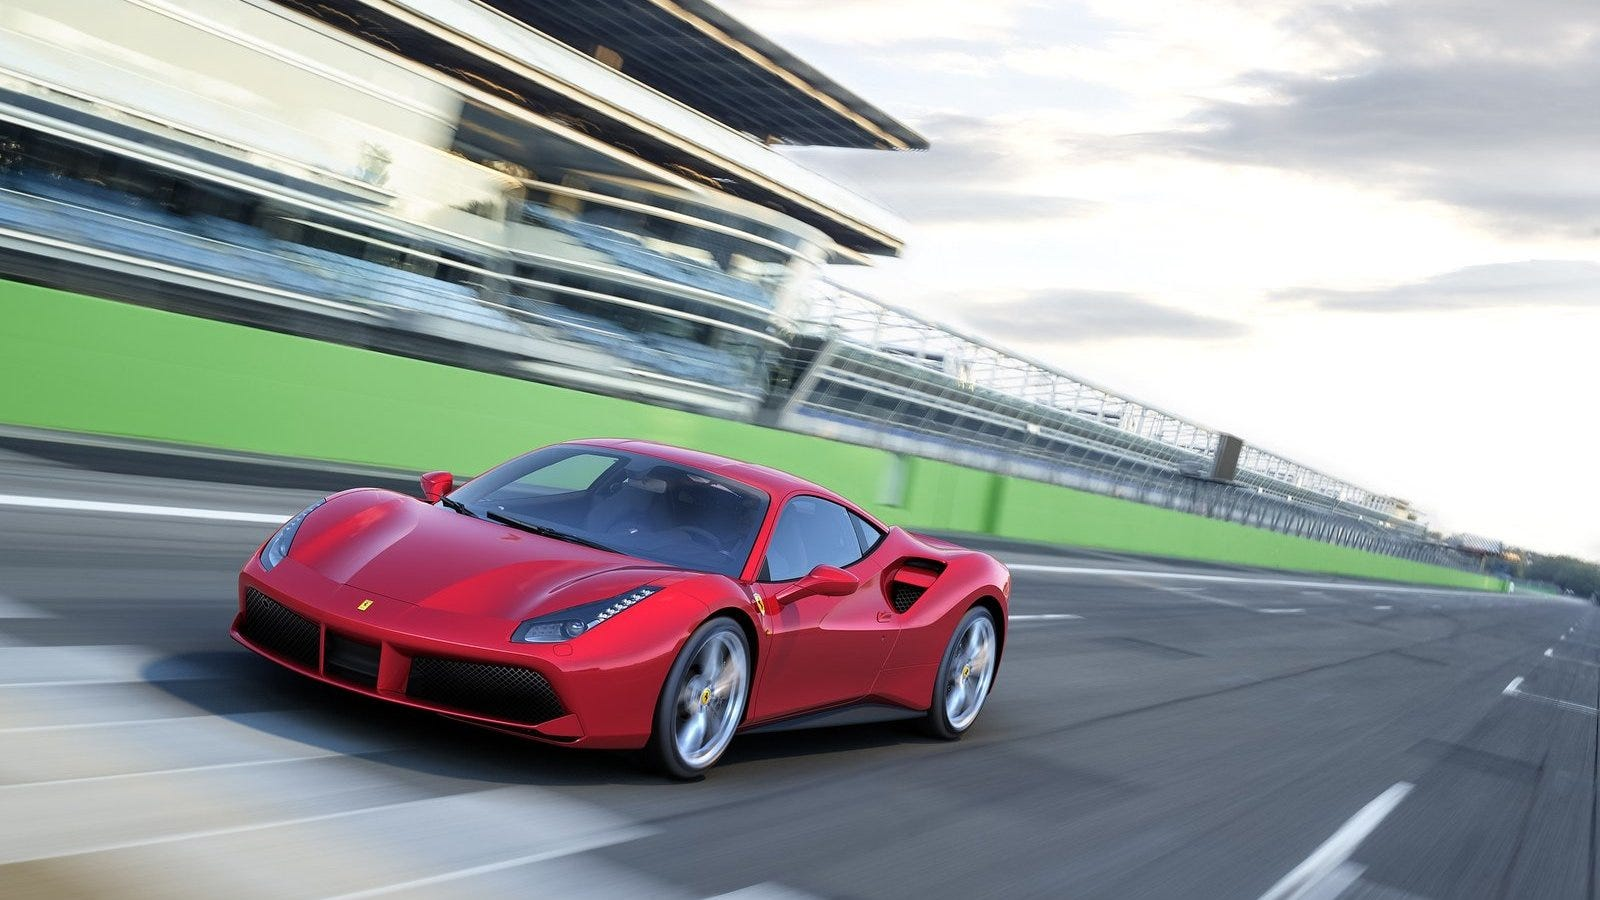 Crazy Rumor Says The Ferrari 488 GTO Will Have 700 HP And Outrun A LaFerrari